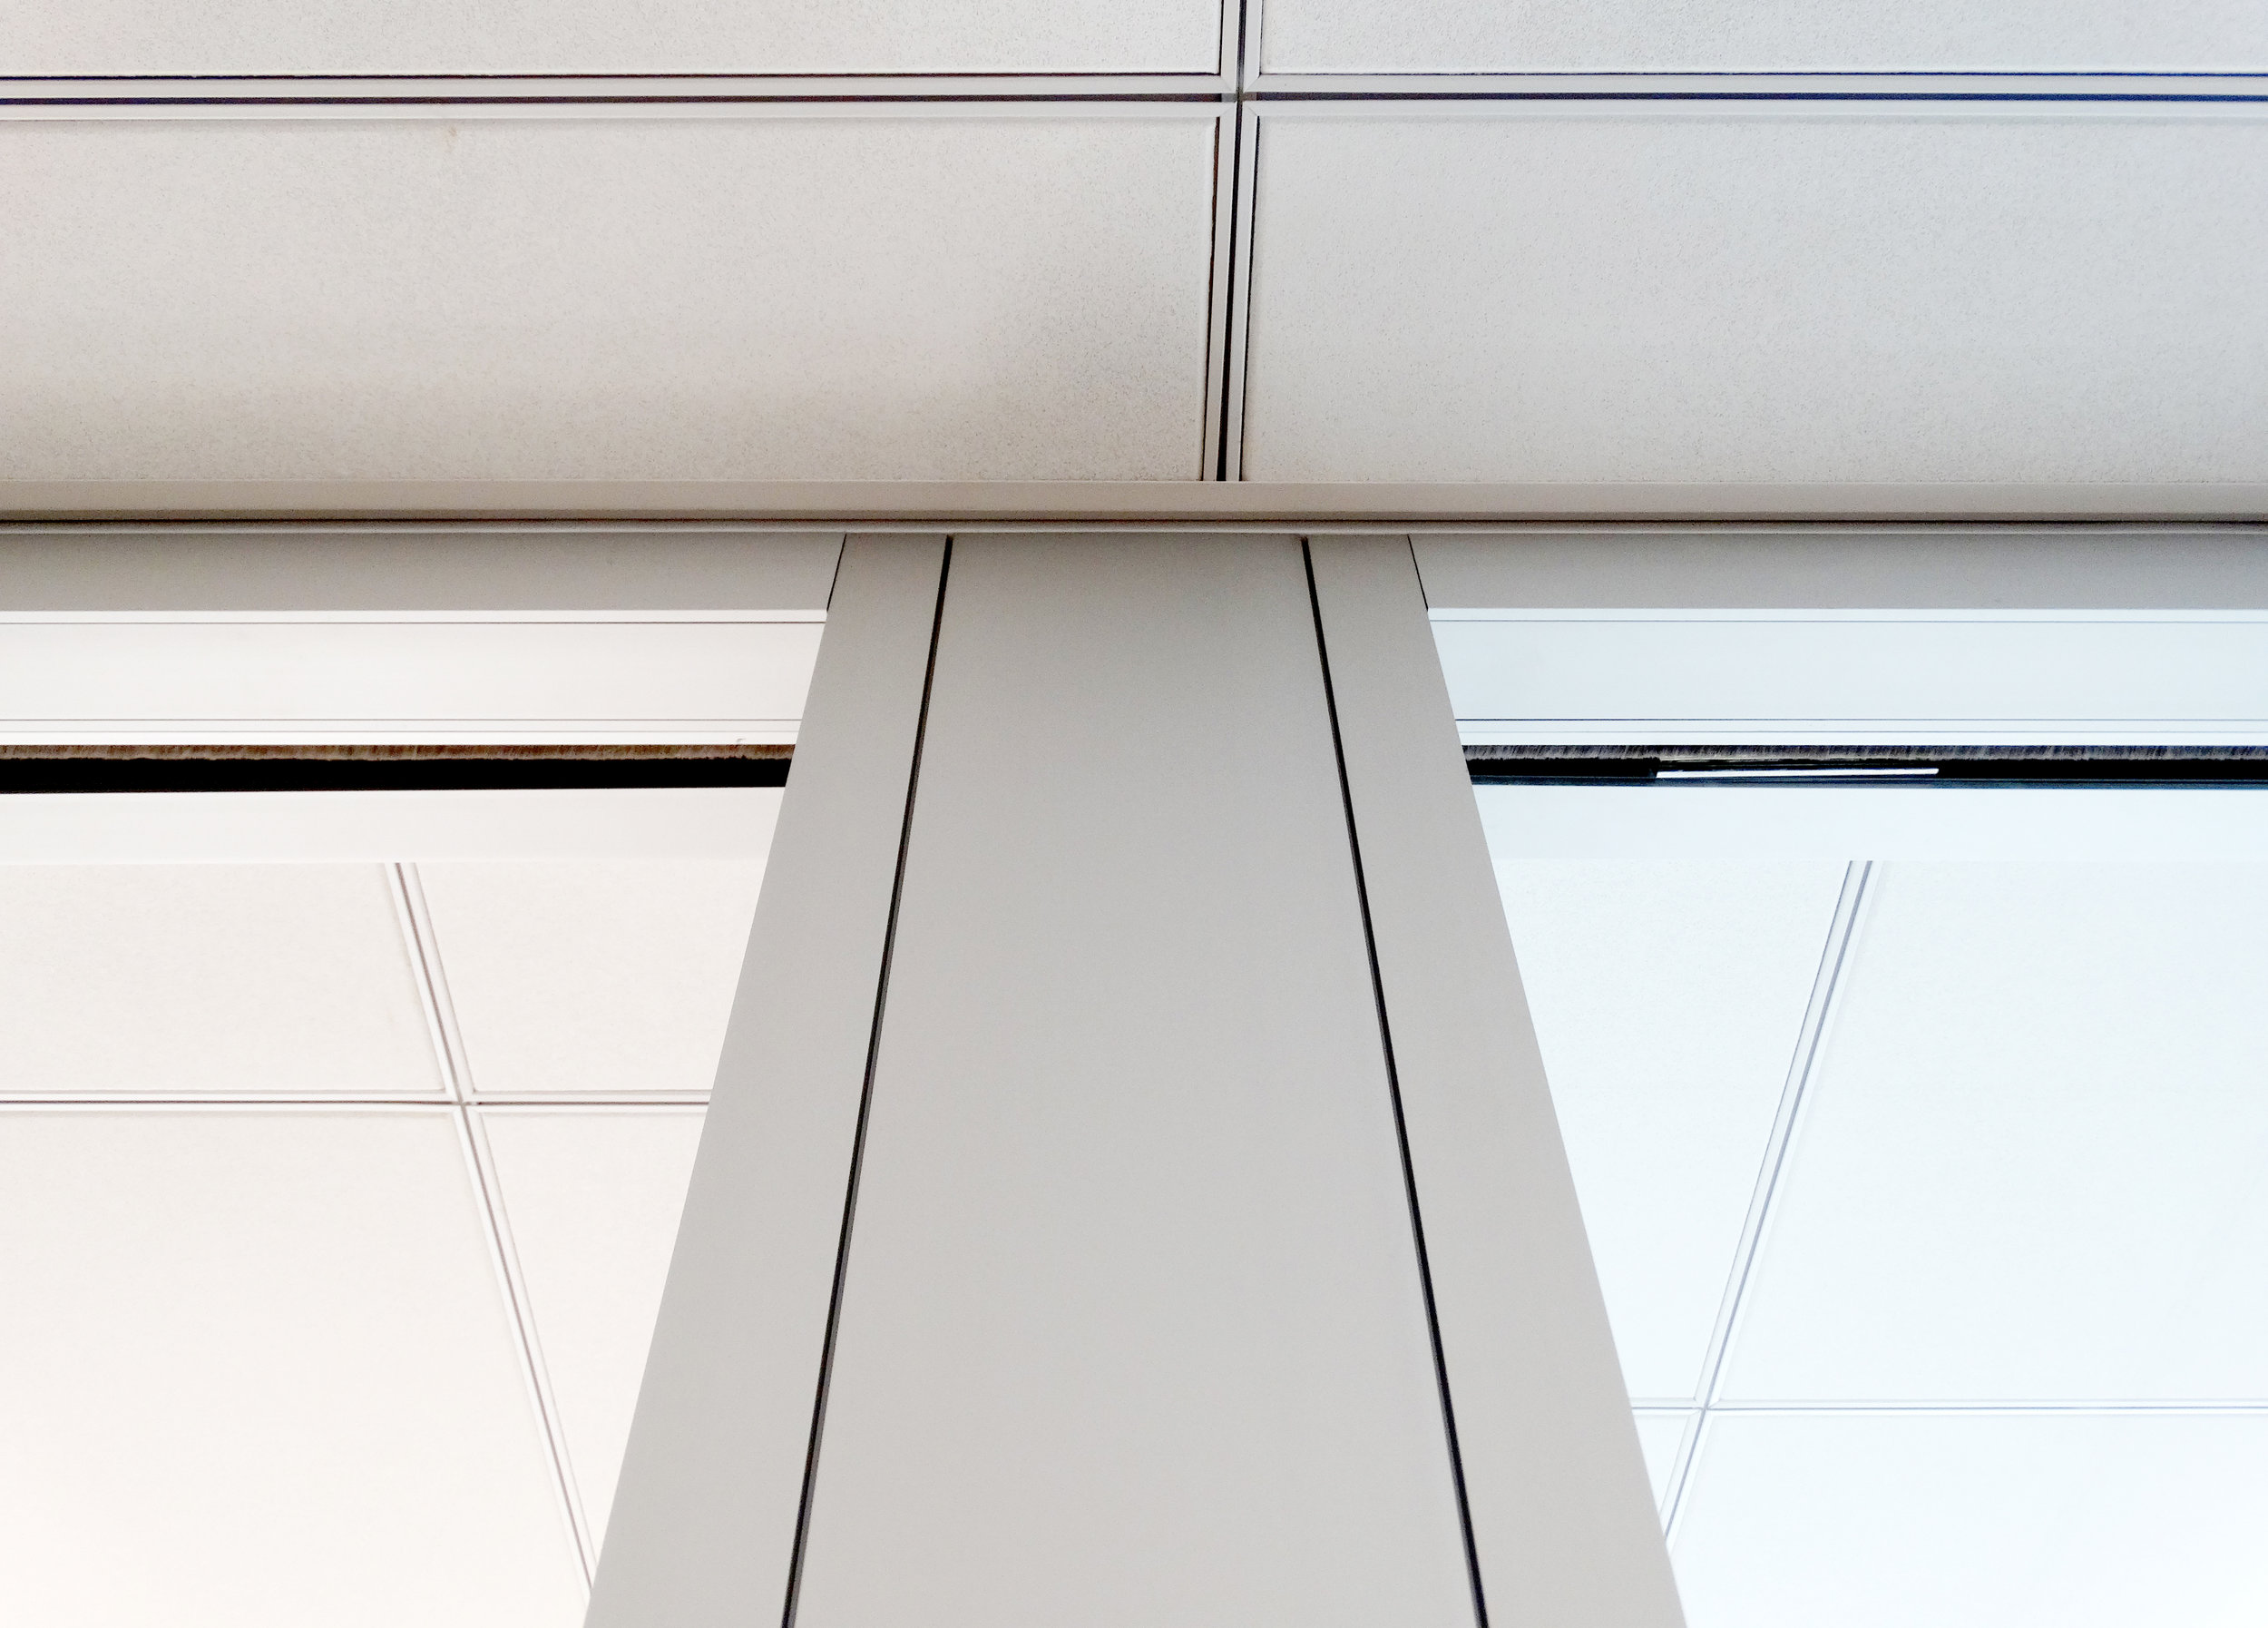 Litespace BiPass Aluminum Post Glass Walls - Spaceworks AI.jpg